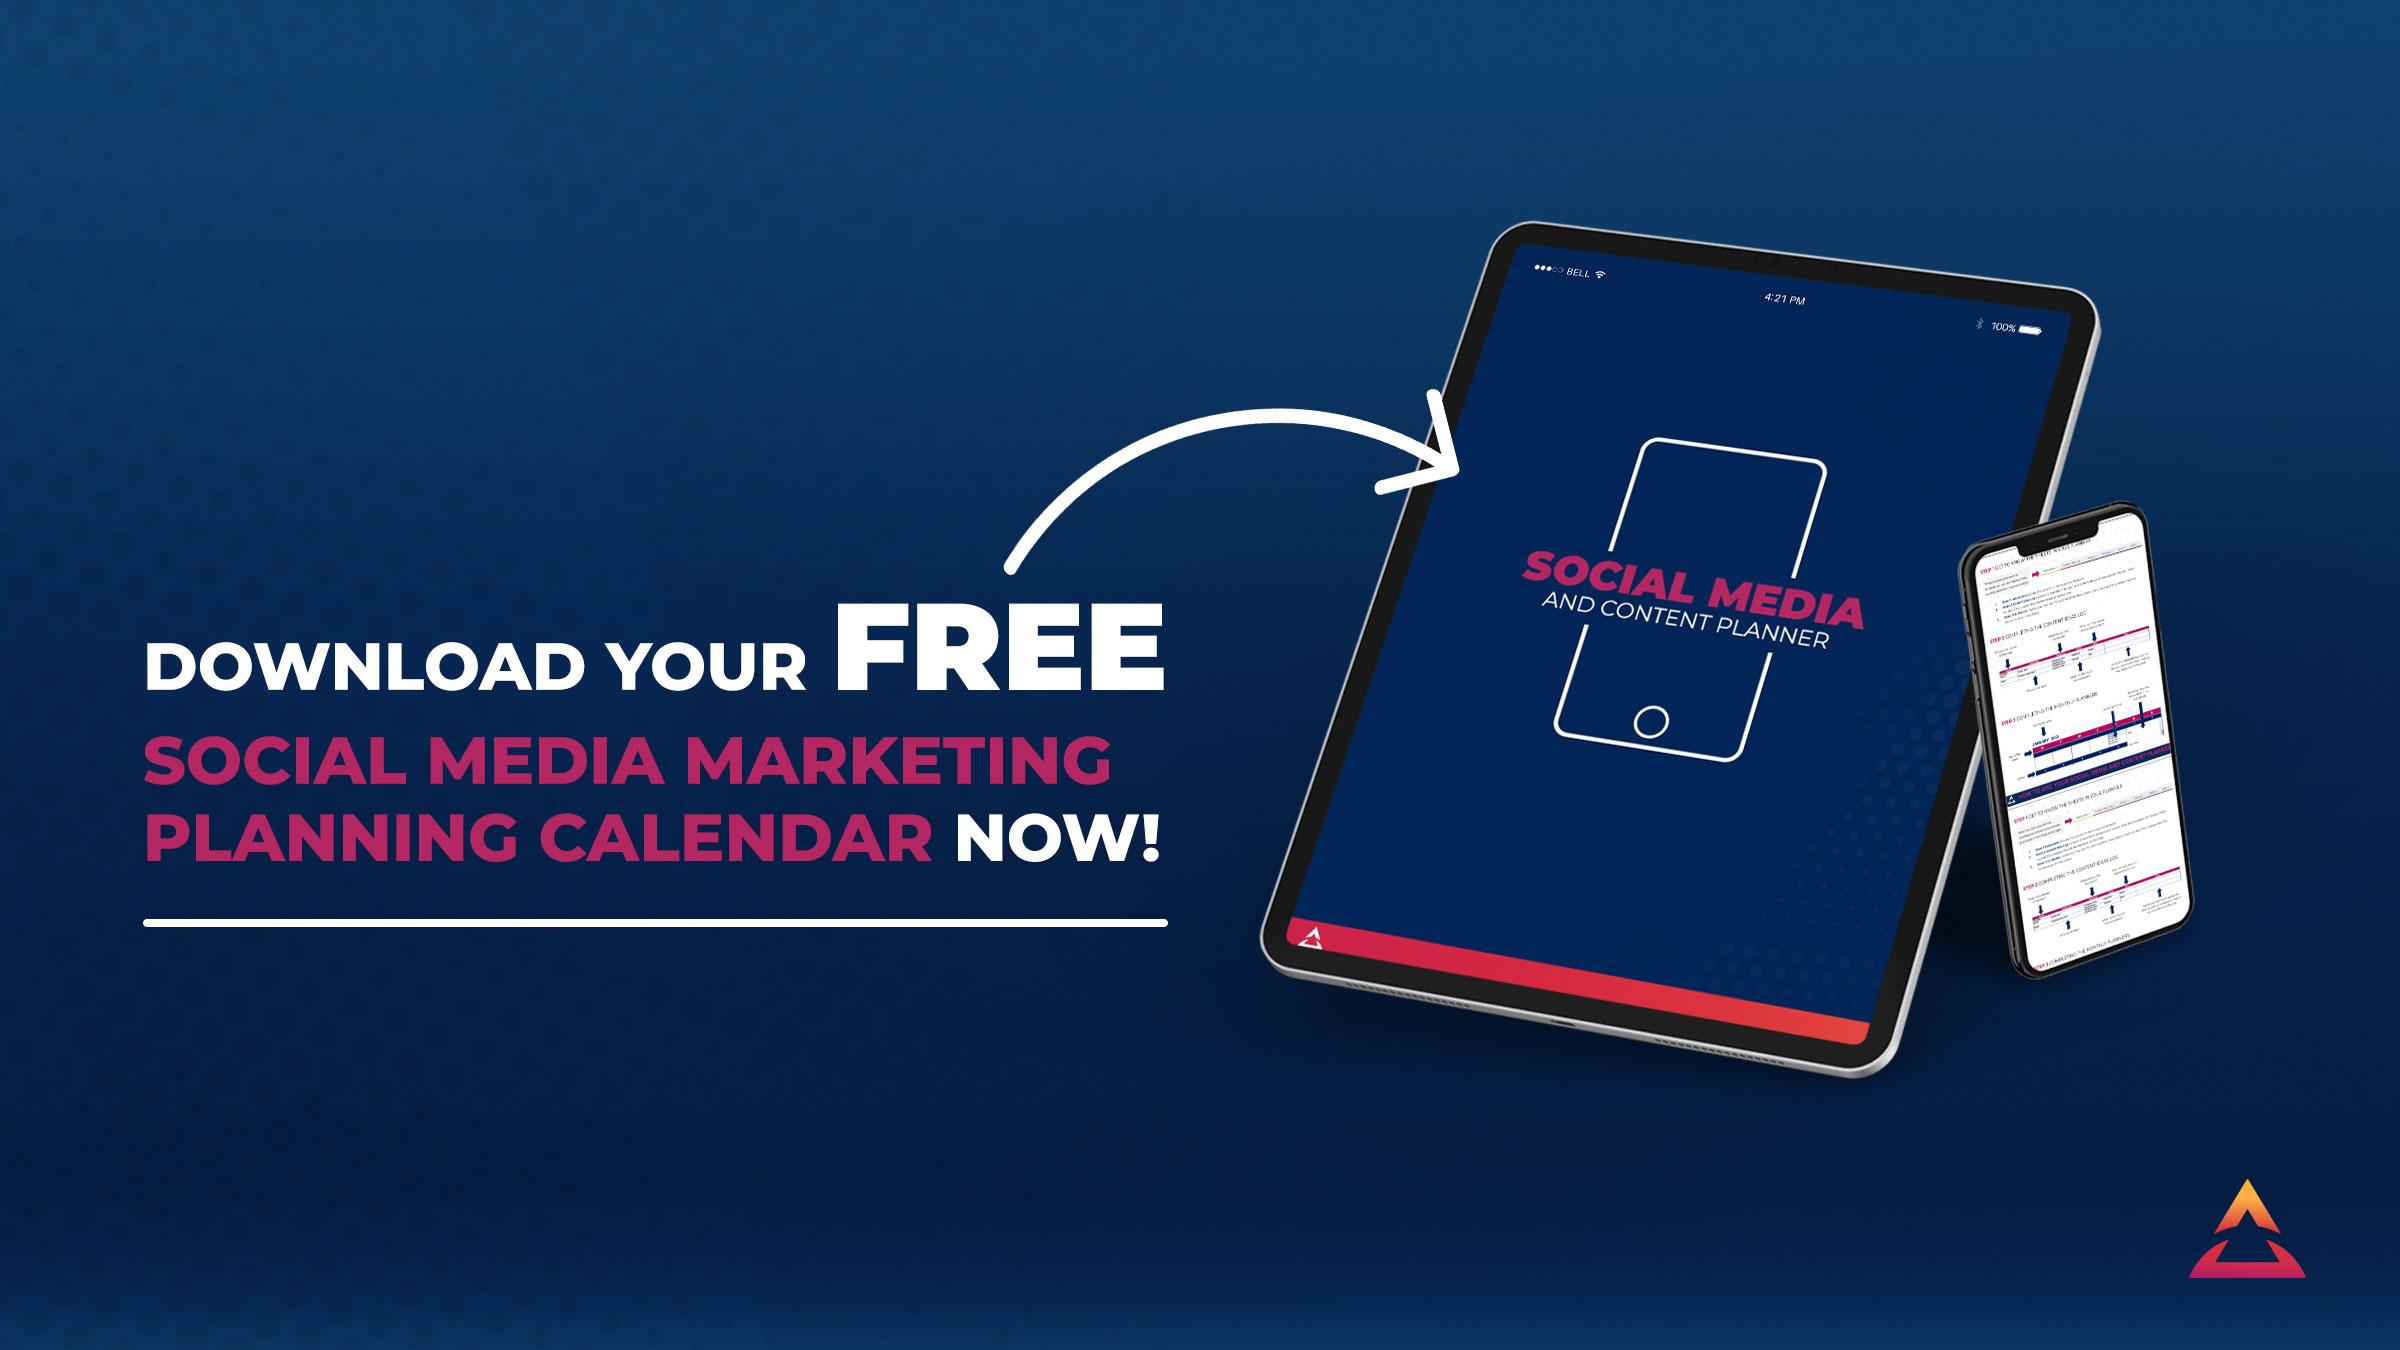 Download your social media marketing planning calendar now